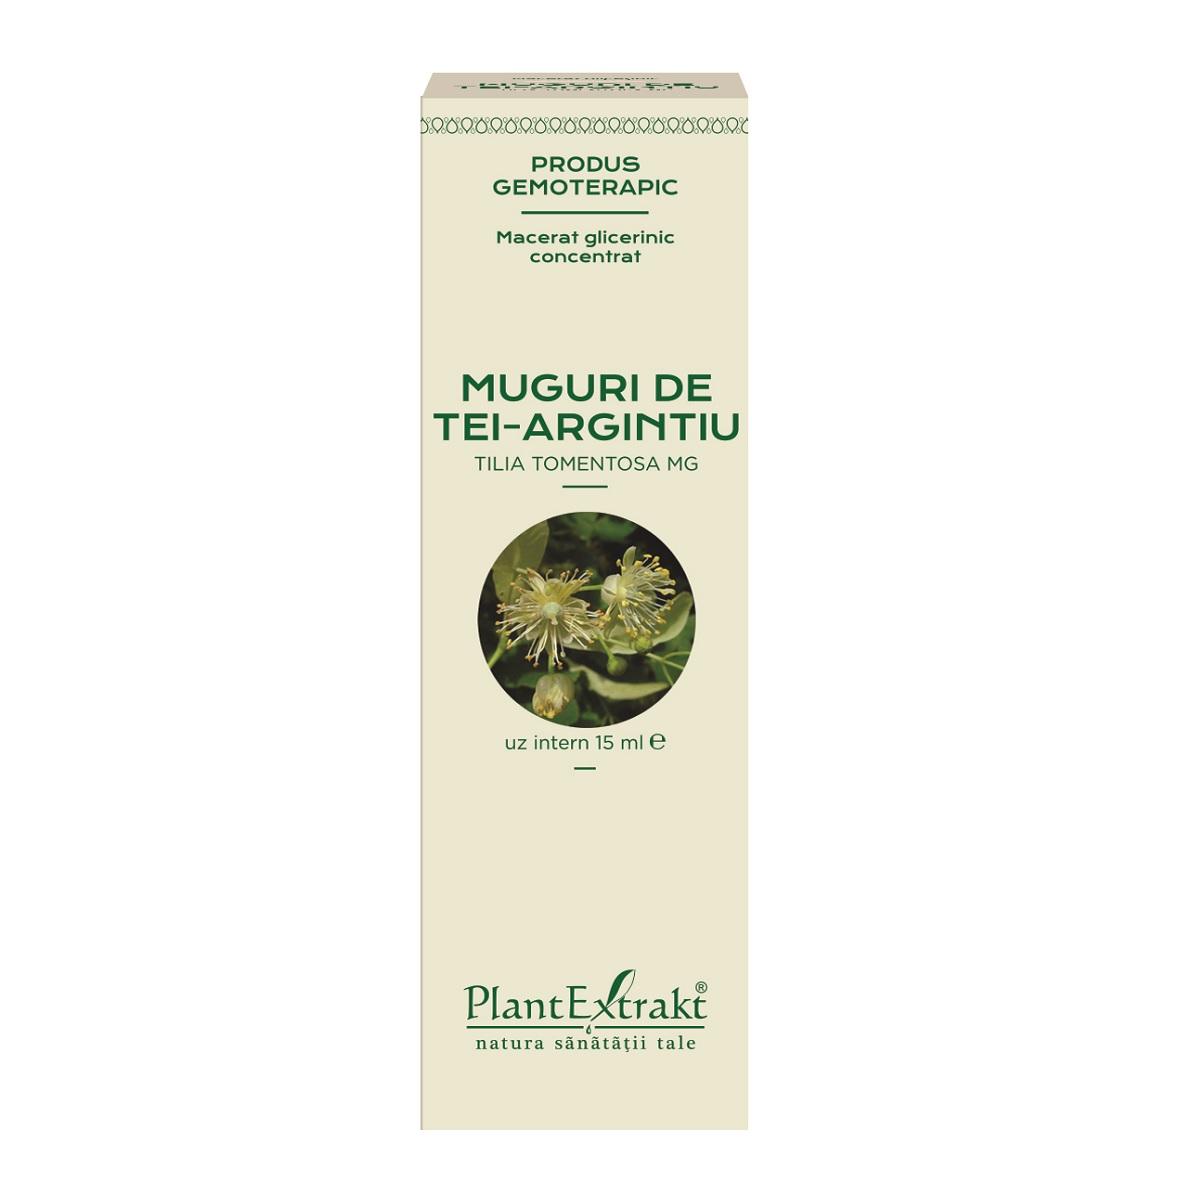 Muguri de Tei Argintiu, 15 ml, Plant Extrakt